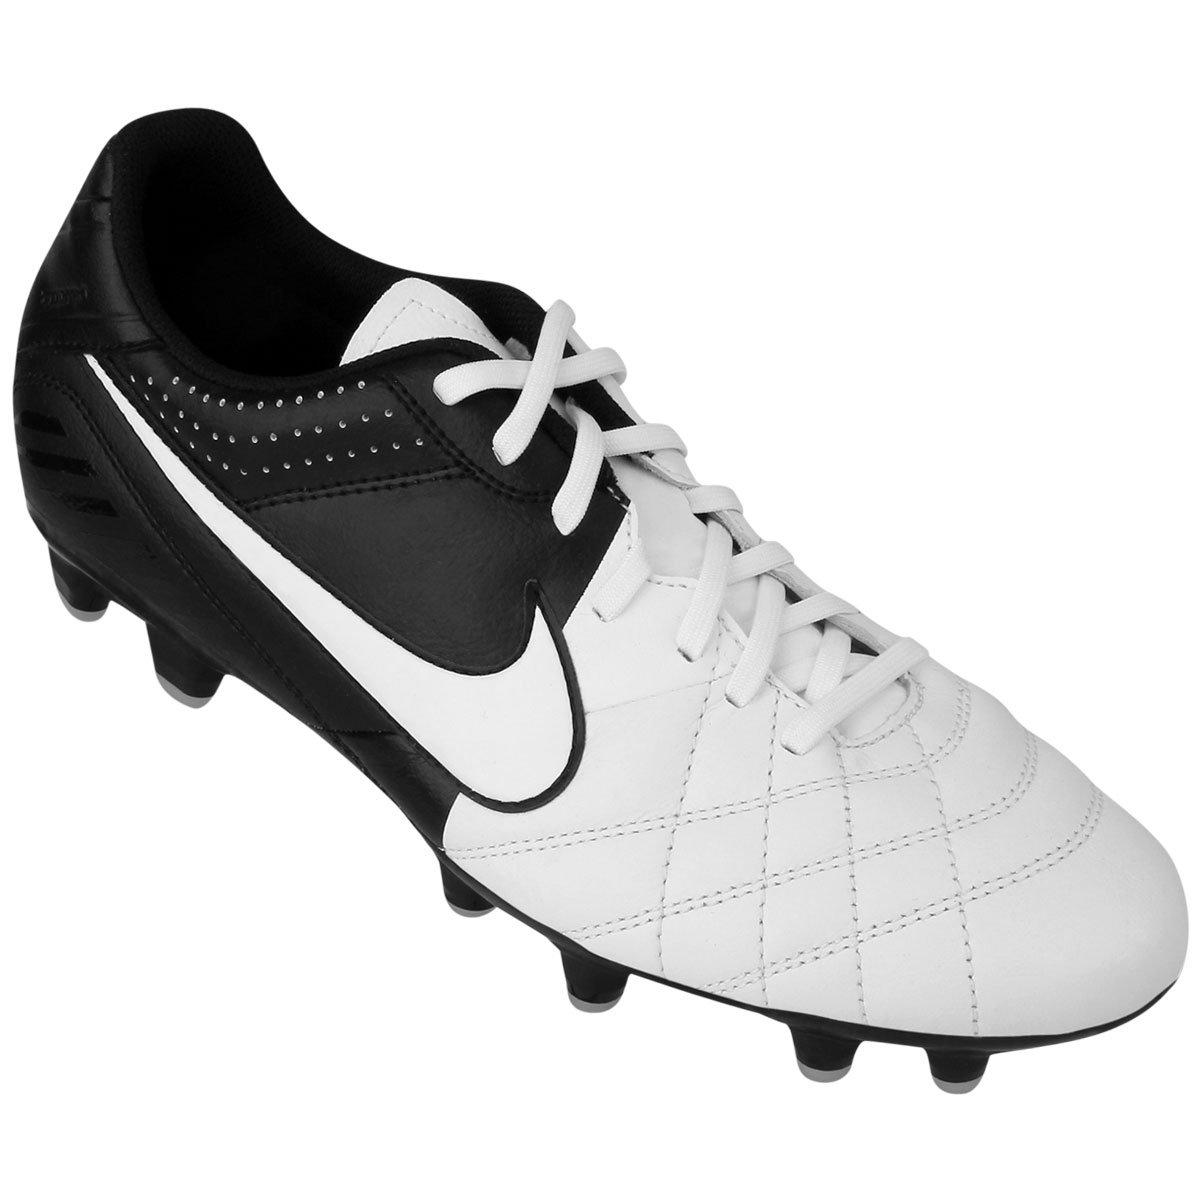 dbfdec4202 Chuteira Nike Tiempo Natural 4 FG